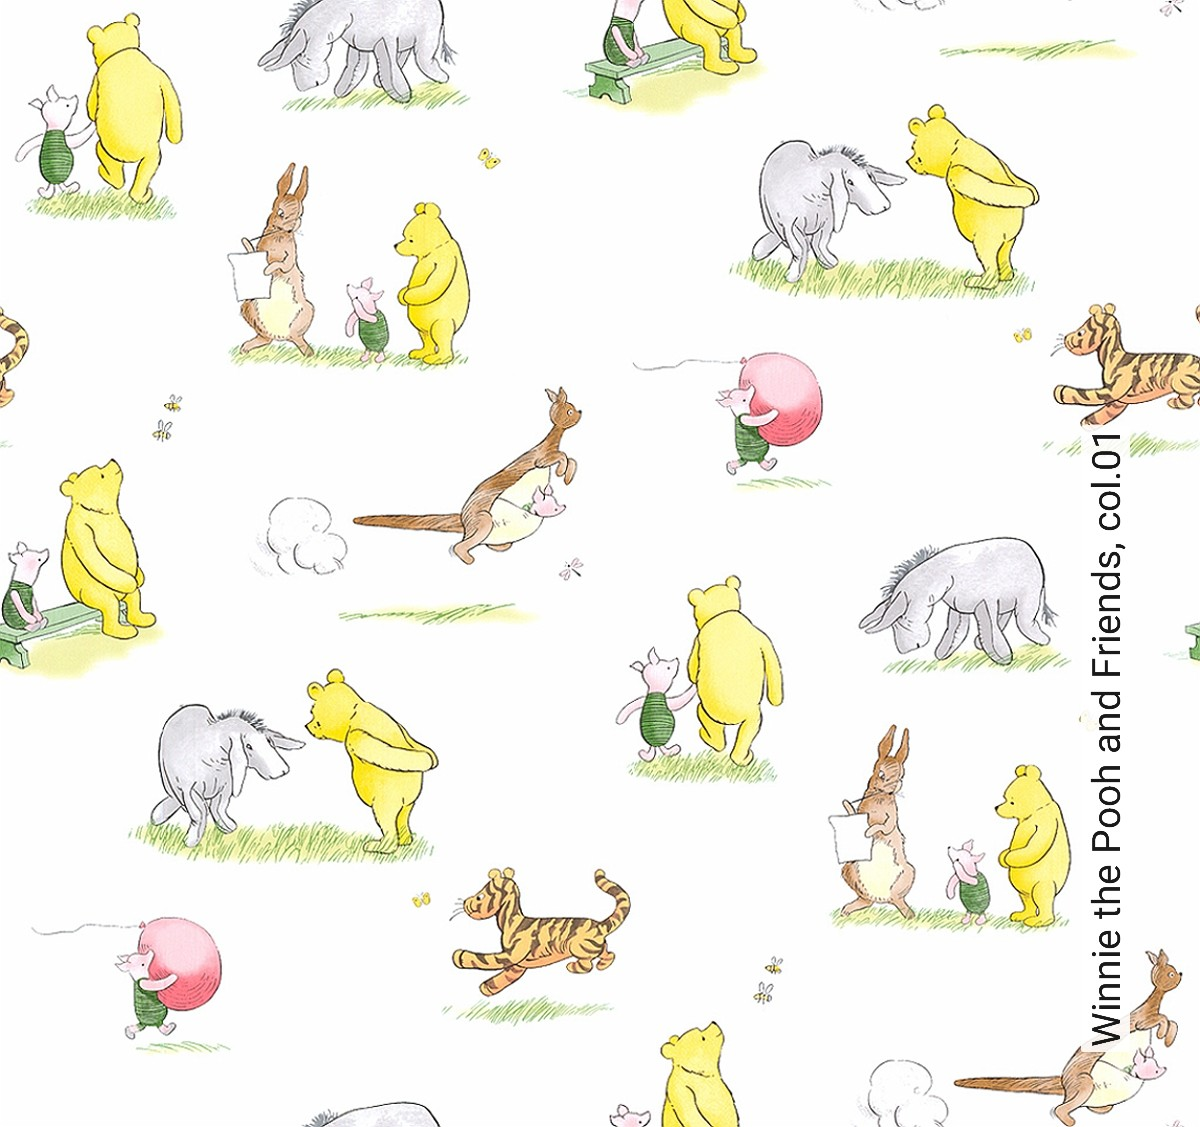 Tapete Winnie the Pooh and Friends, col.01 | Die TapetenAgentur